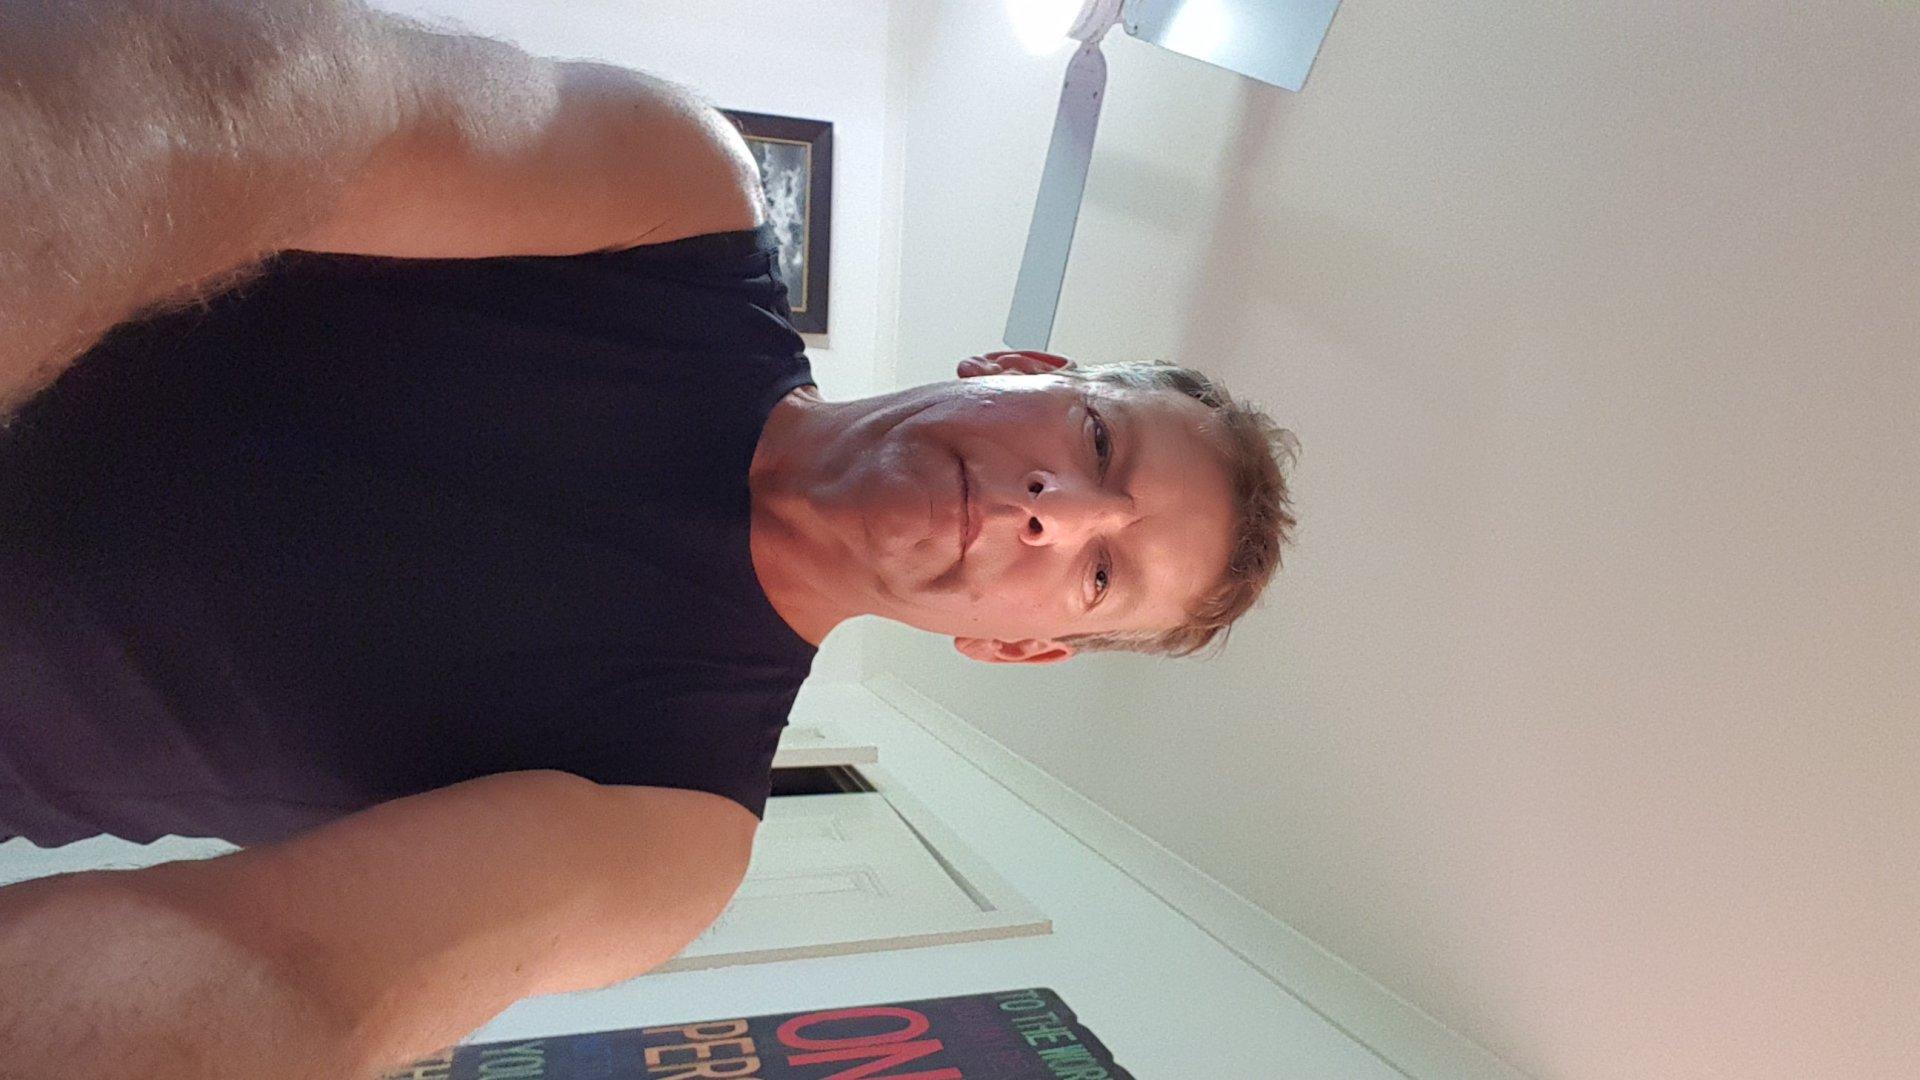 Roo362 from South Australia,Australia